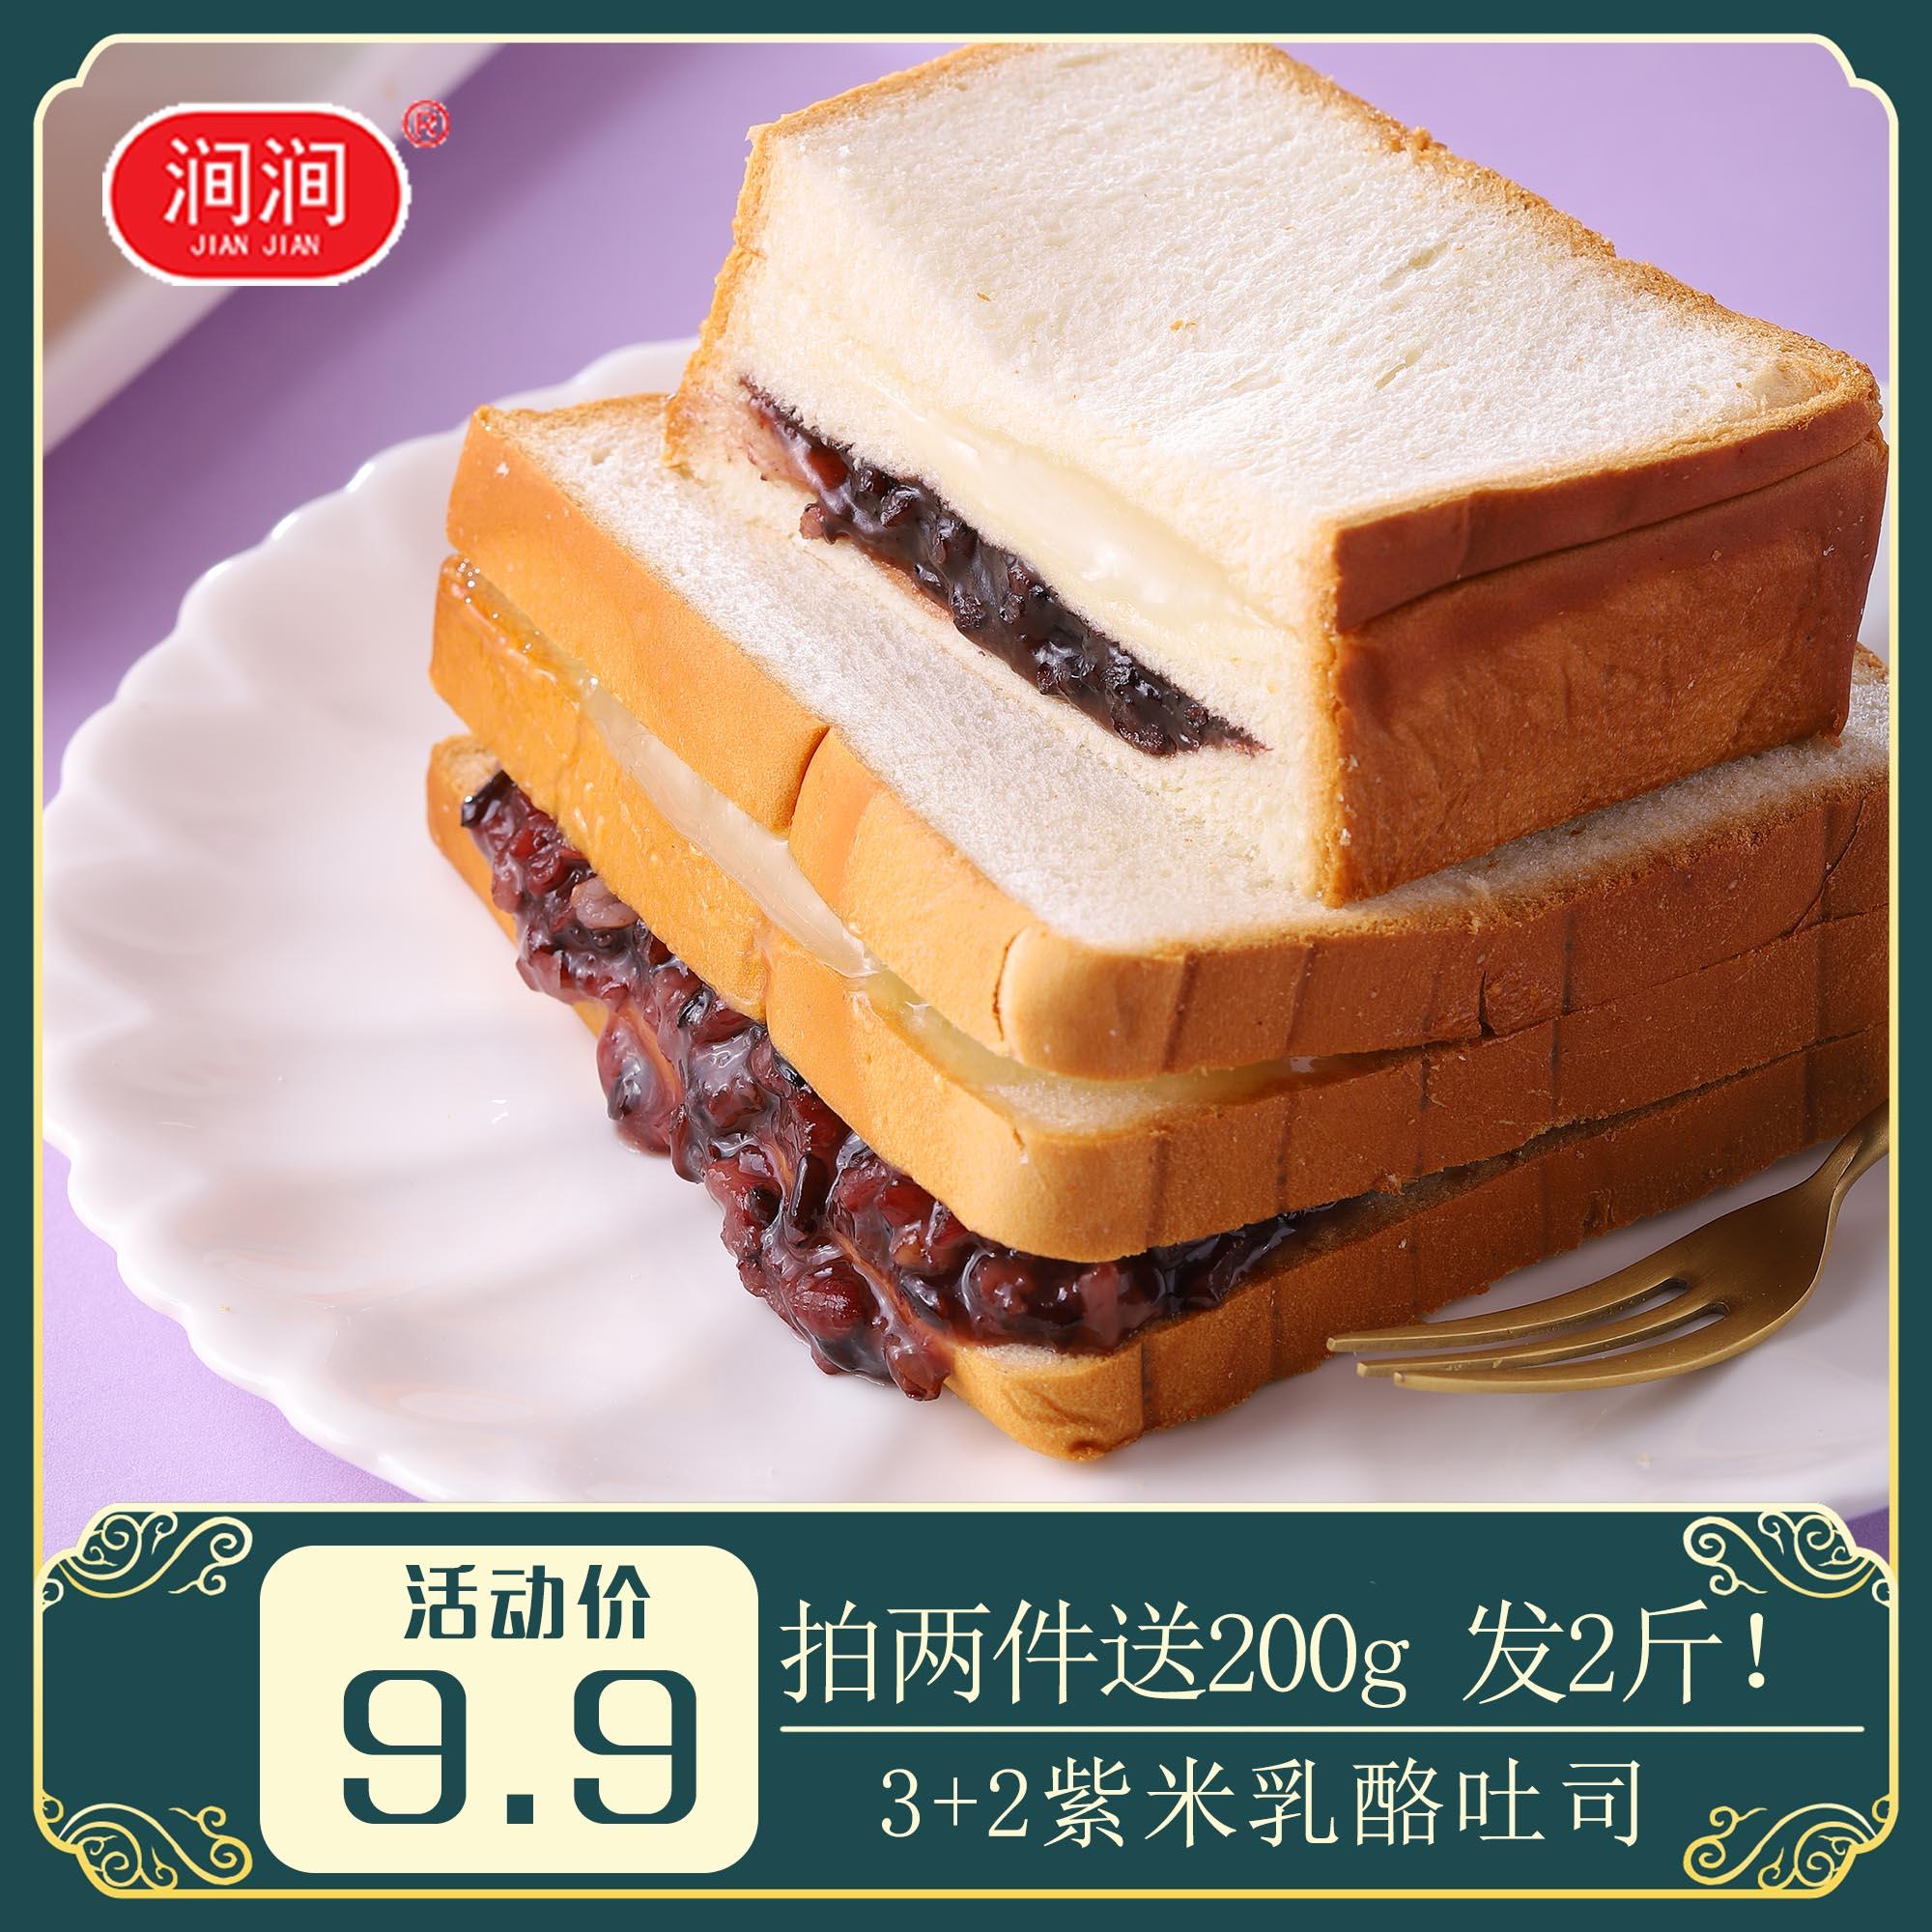 B涧涧3+2紫米乳酪面包夹心奶酪糕点吐司蛋糕营养早餐零食休闲整箱